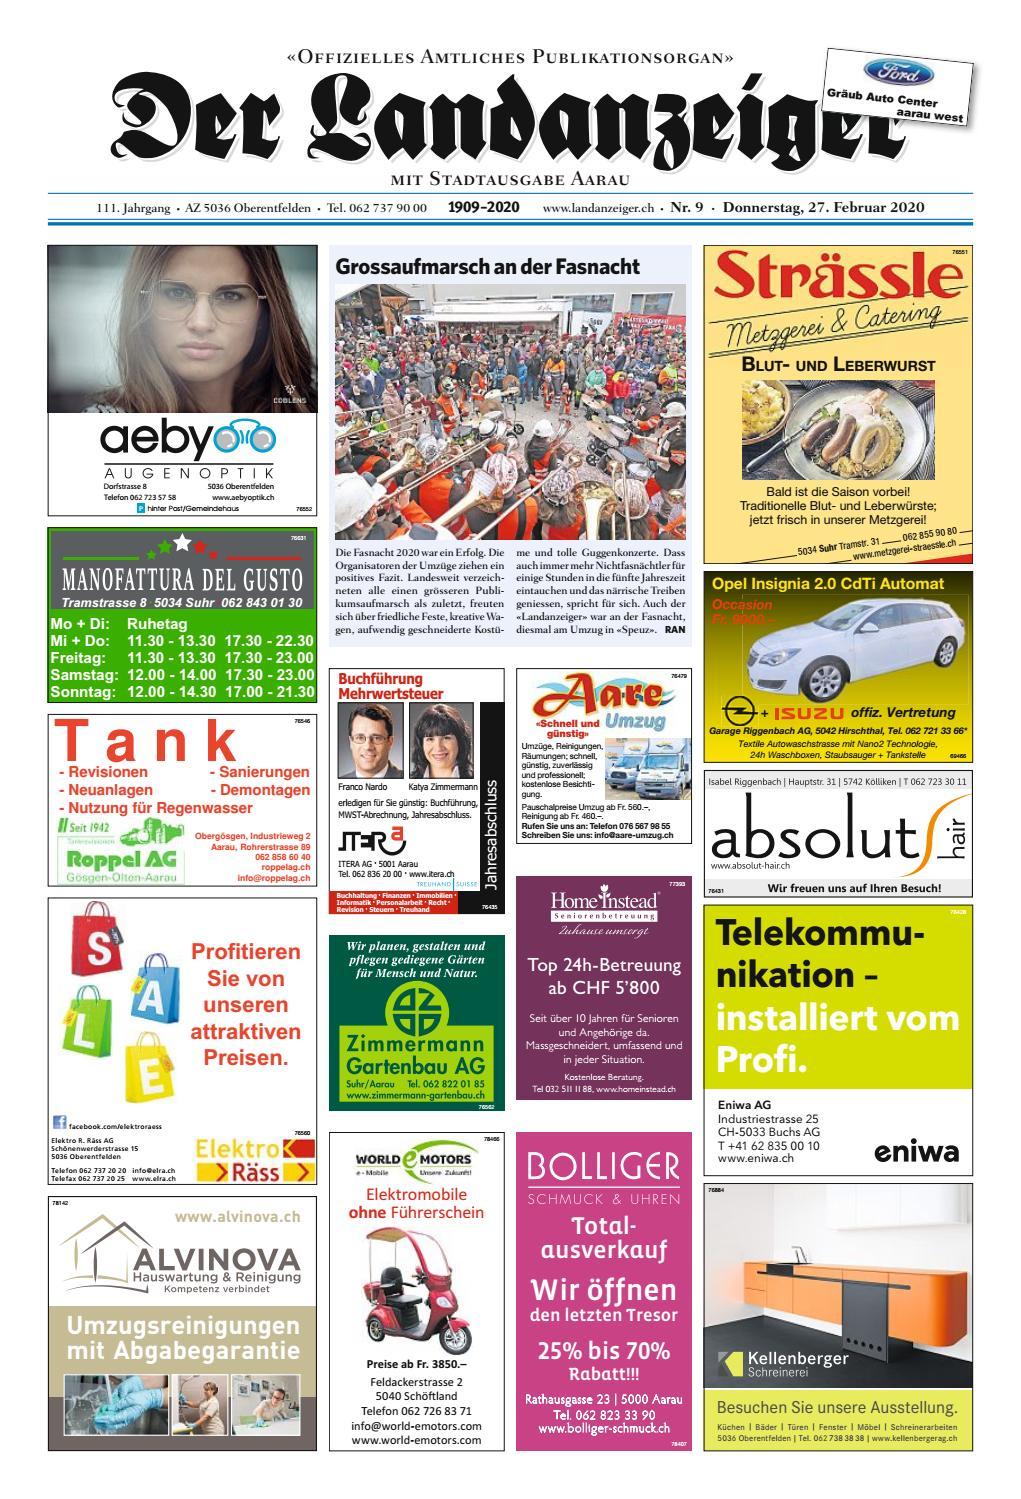 Aarau: ussere Grabenstrasse wird wegen Bauarbeiten